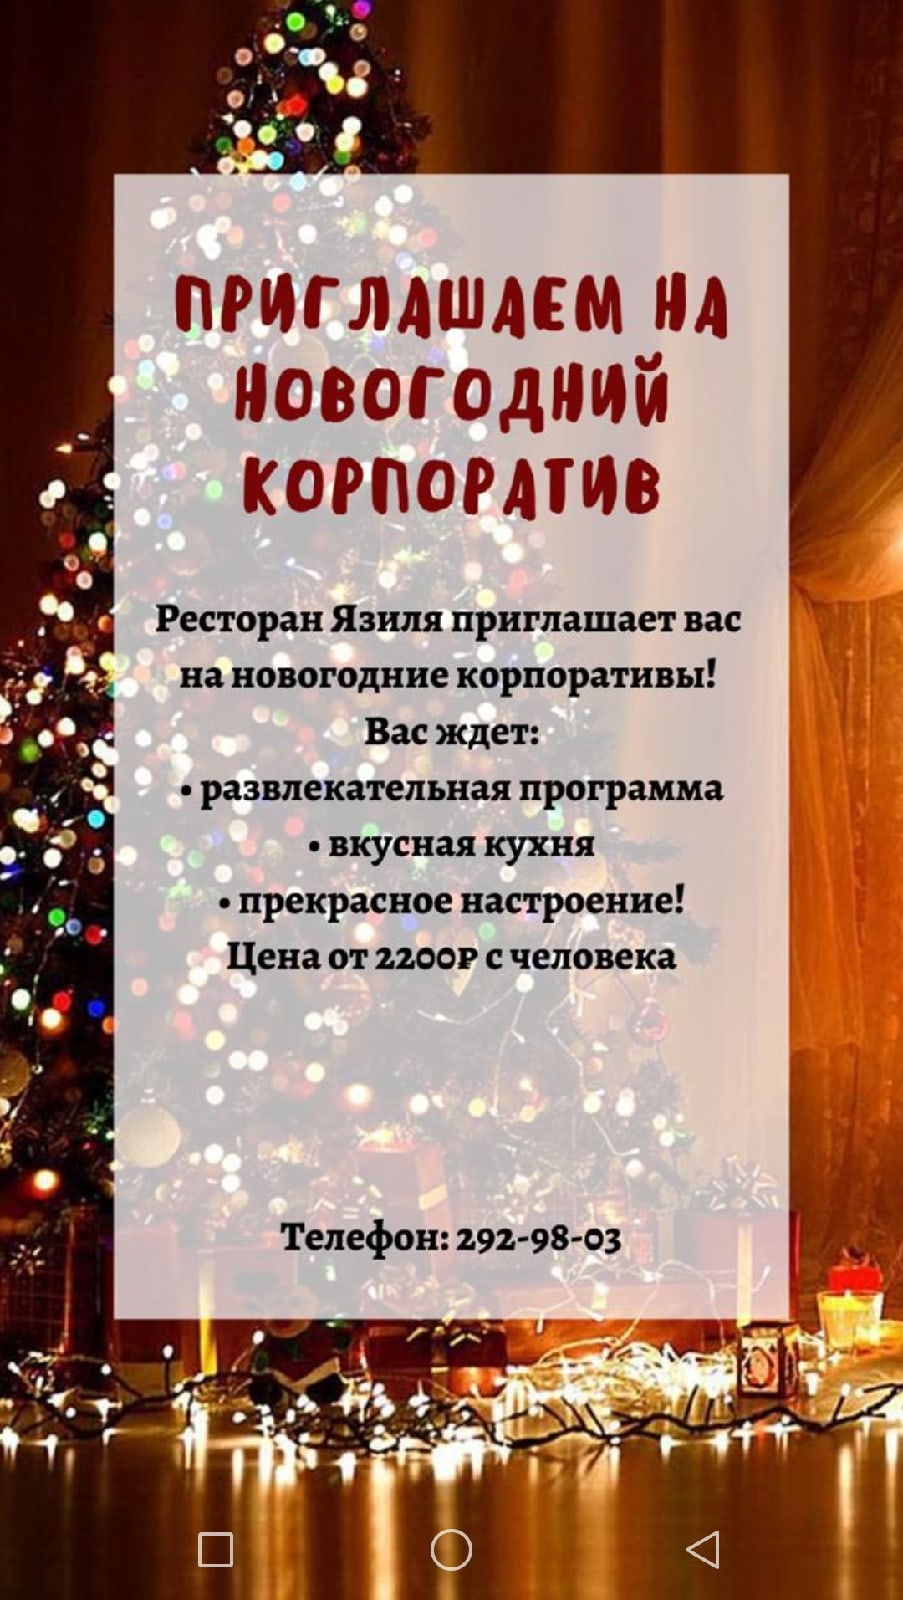 Кафе, арт-кафе «Язиля» - Вконтакте